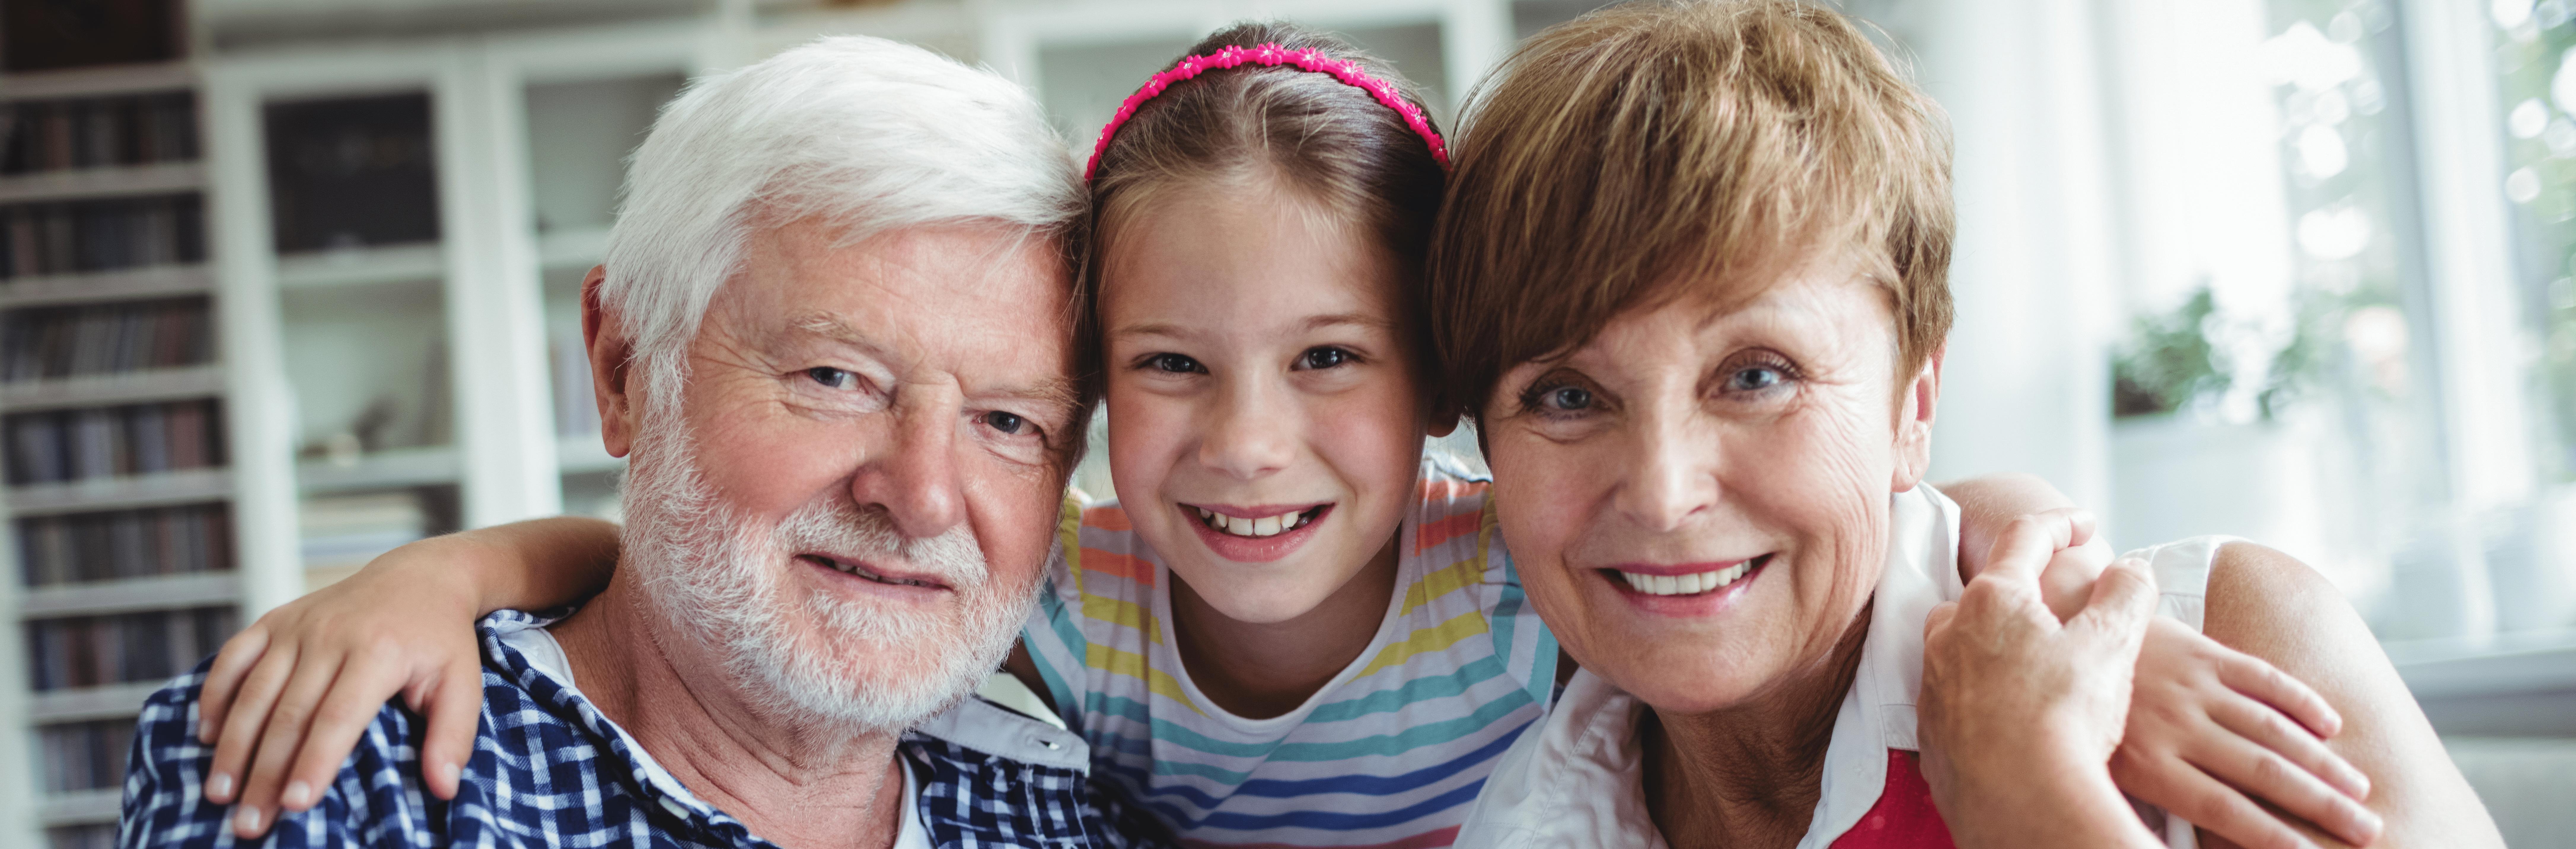 Grandparentswithhergranddaughterathome10